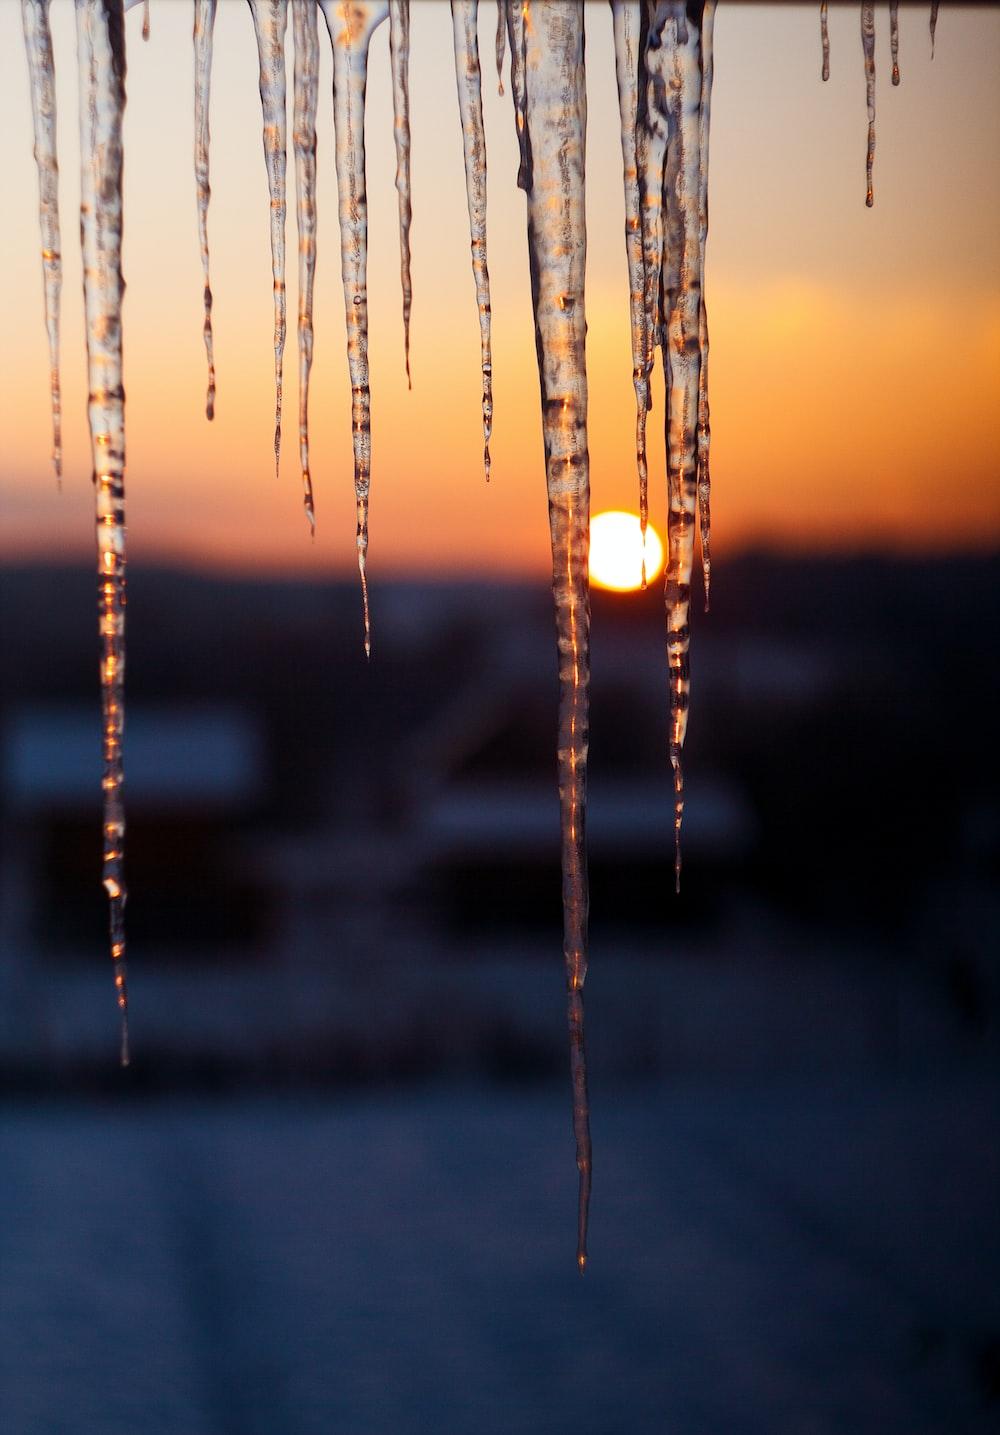 shallow focus photo of ice